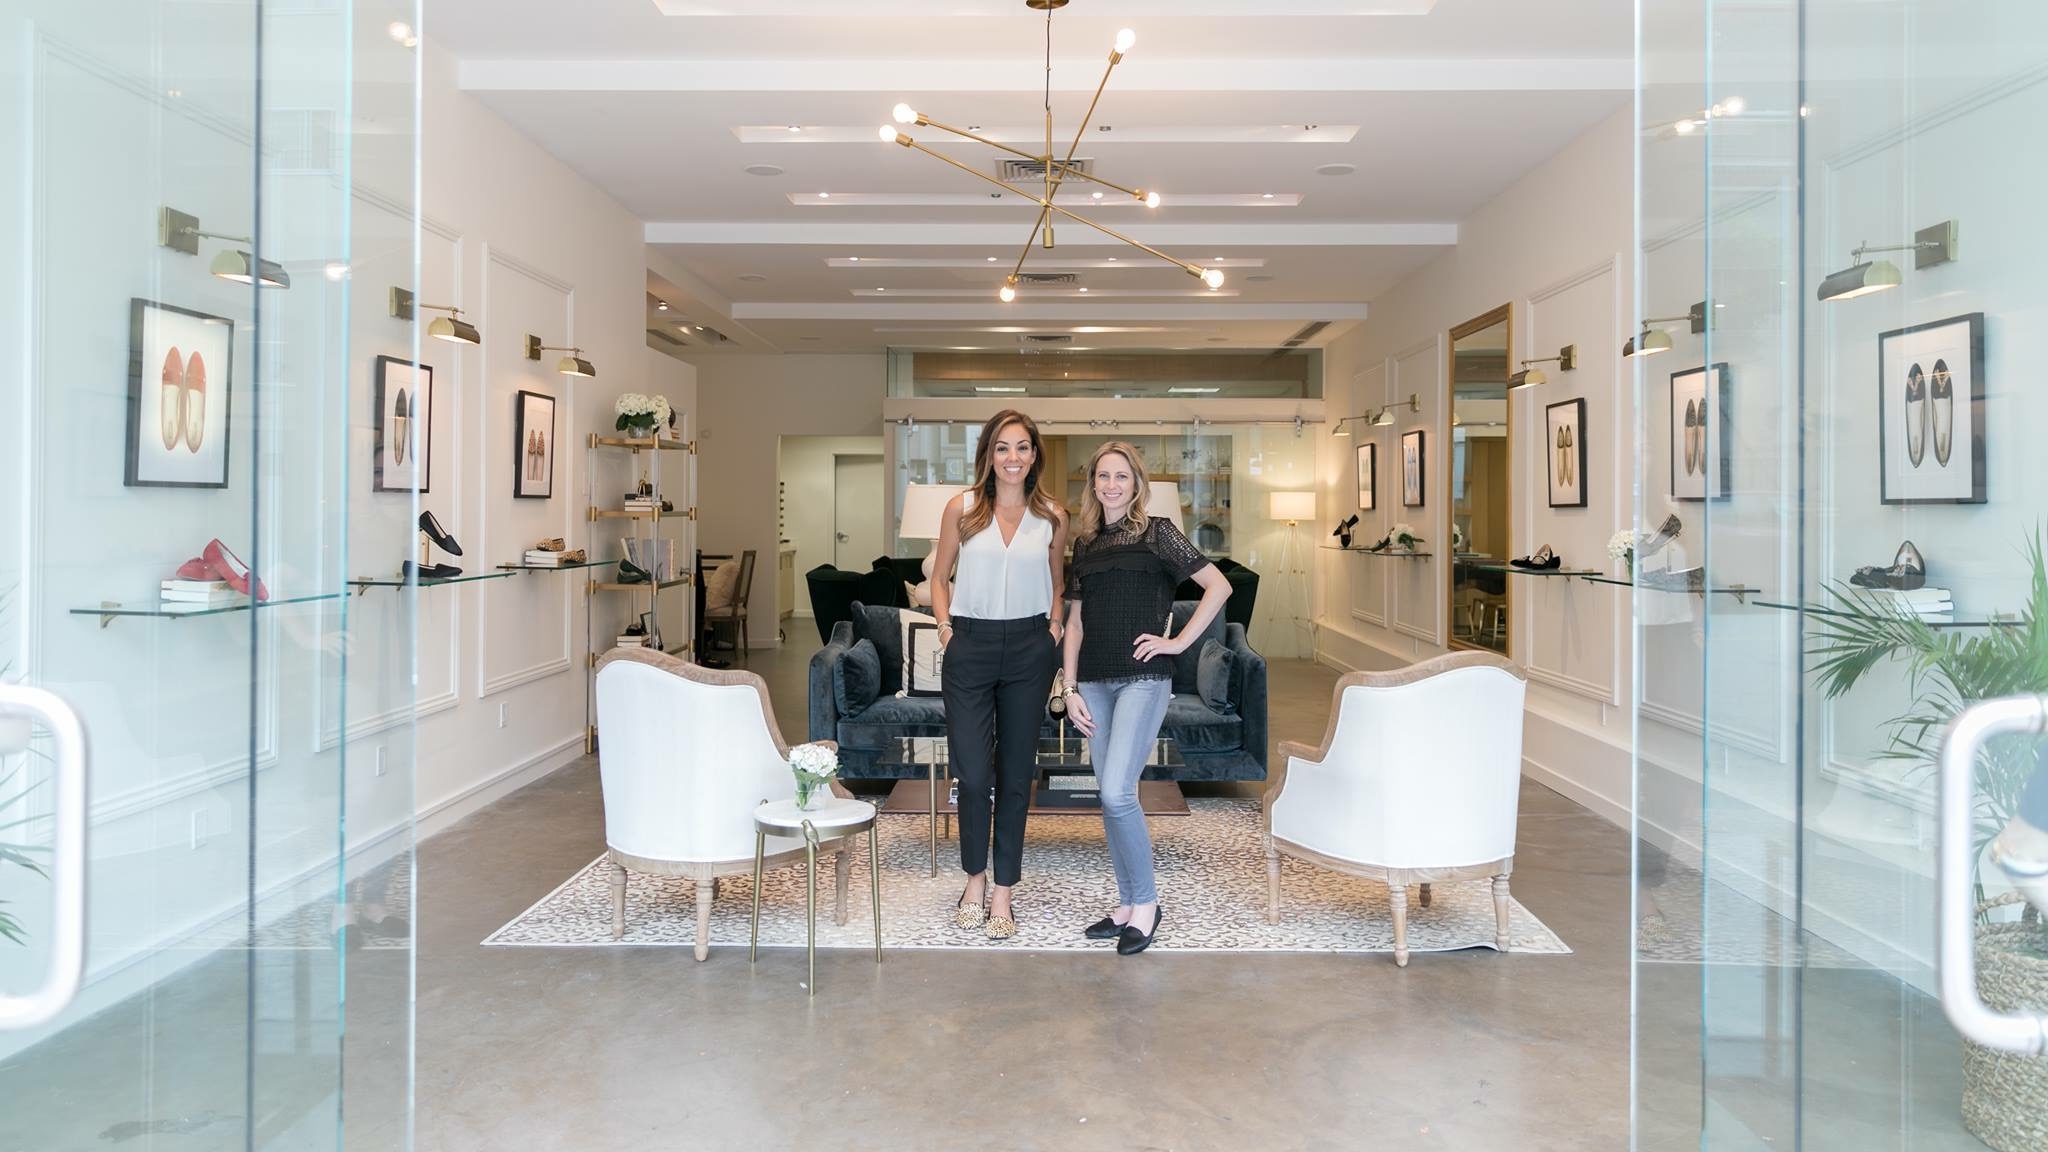 Bianca Gates and Marisa Sharkey pose inside Birdies